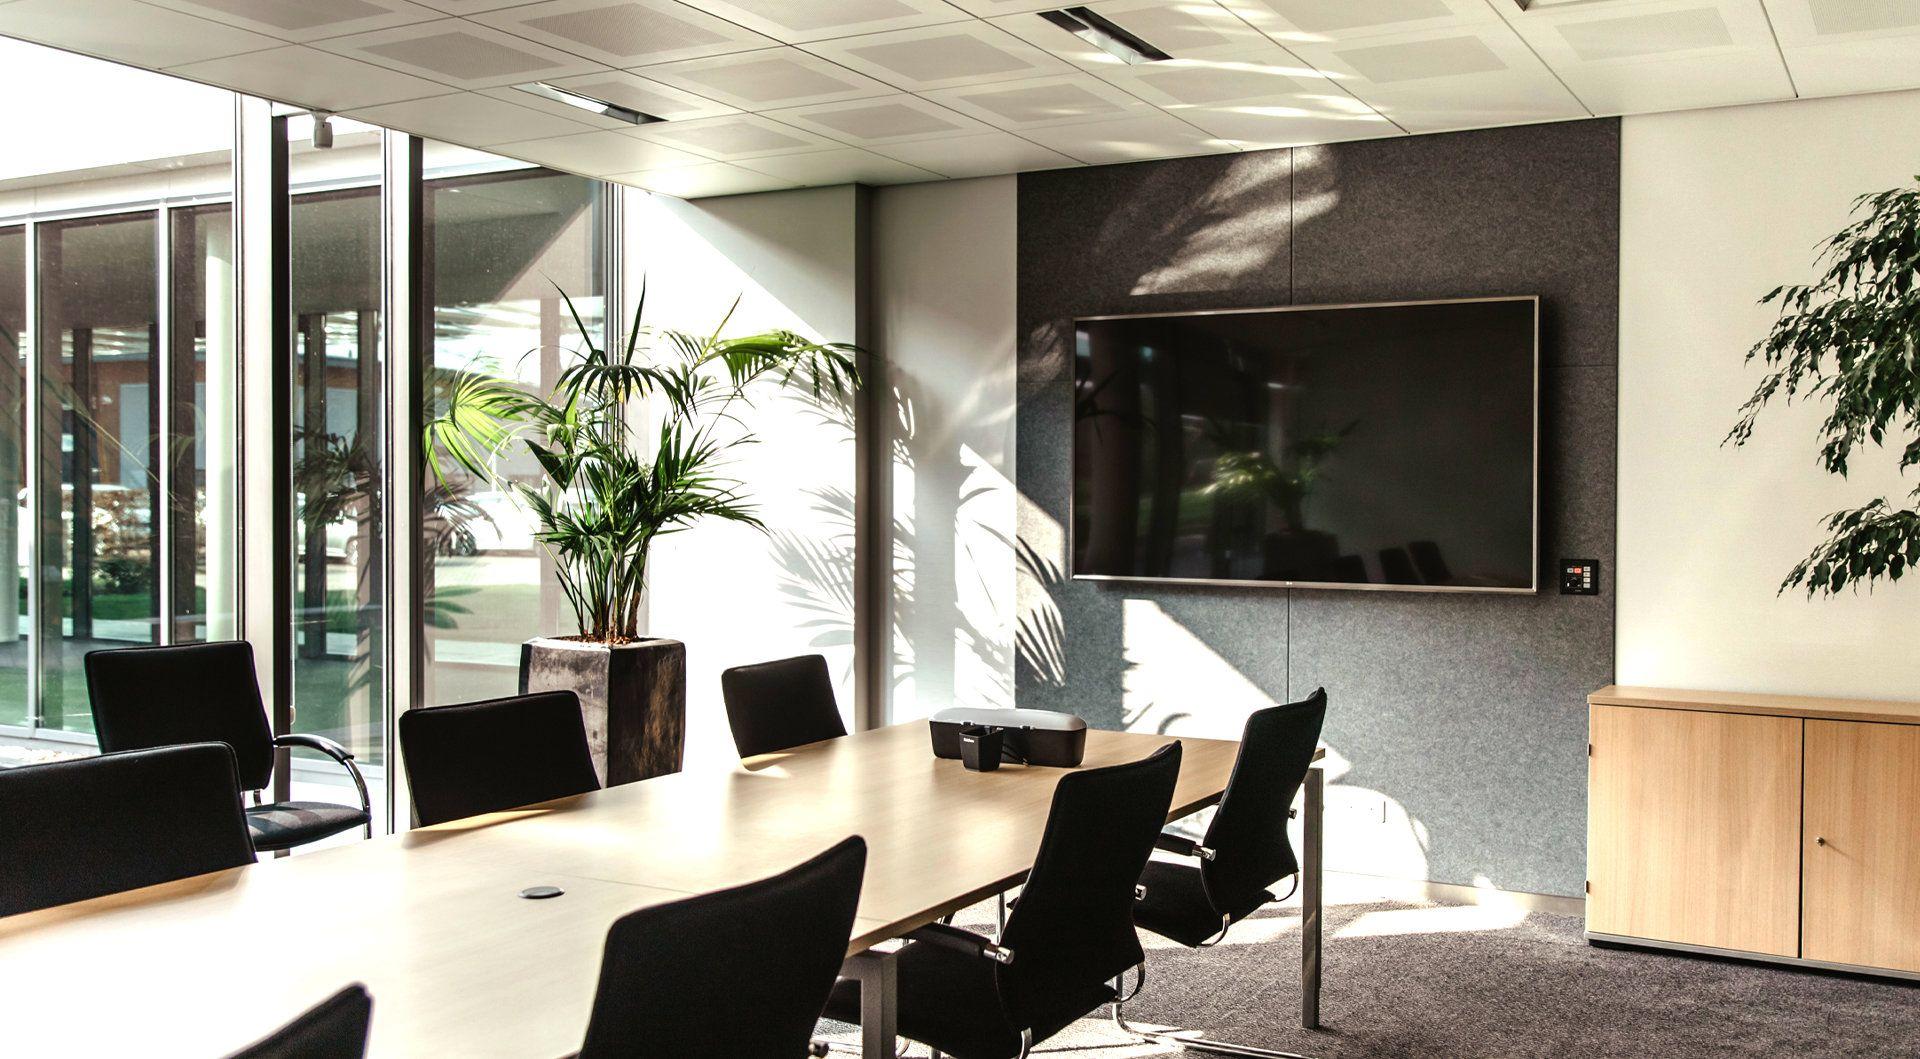 "Conen Mounts SCETANHVW14 flat panel muur steun 2,54 m (100"") Aluminium, Zwart - Case studie de vries"